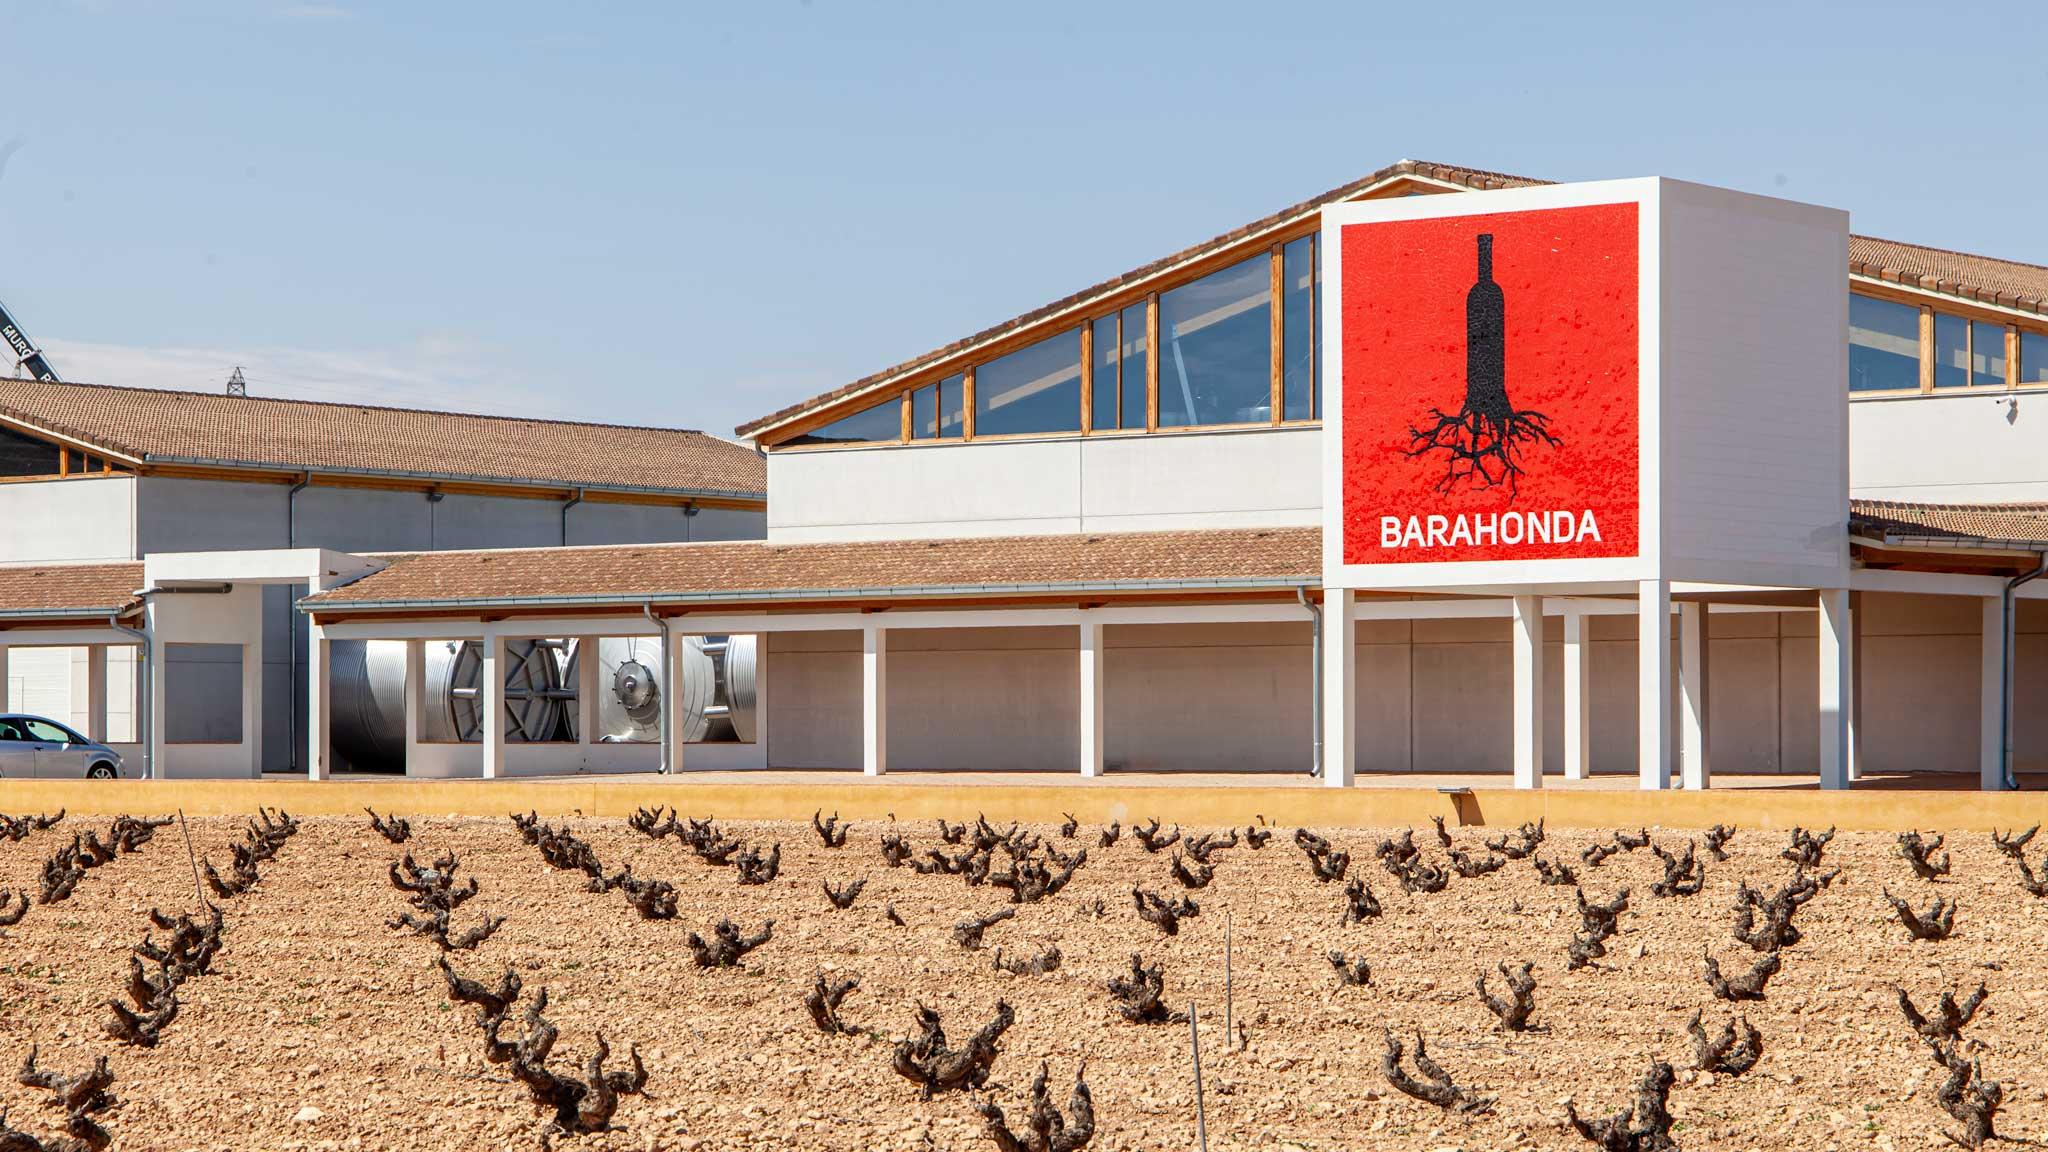 Barahonda Winery in Yecla, Murcia